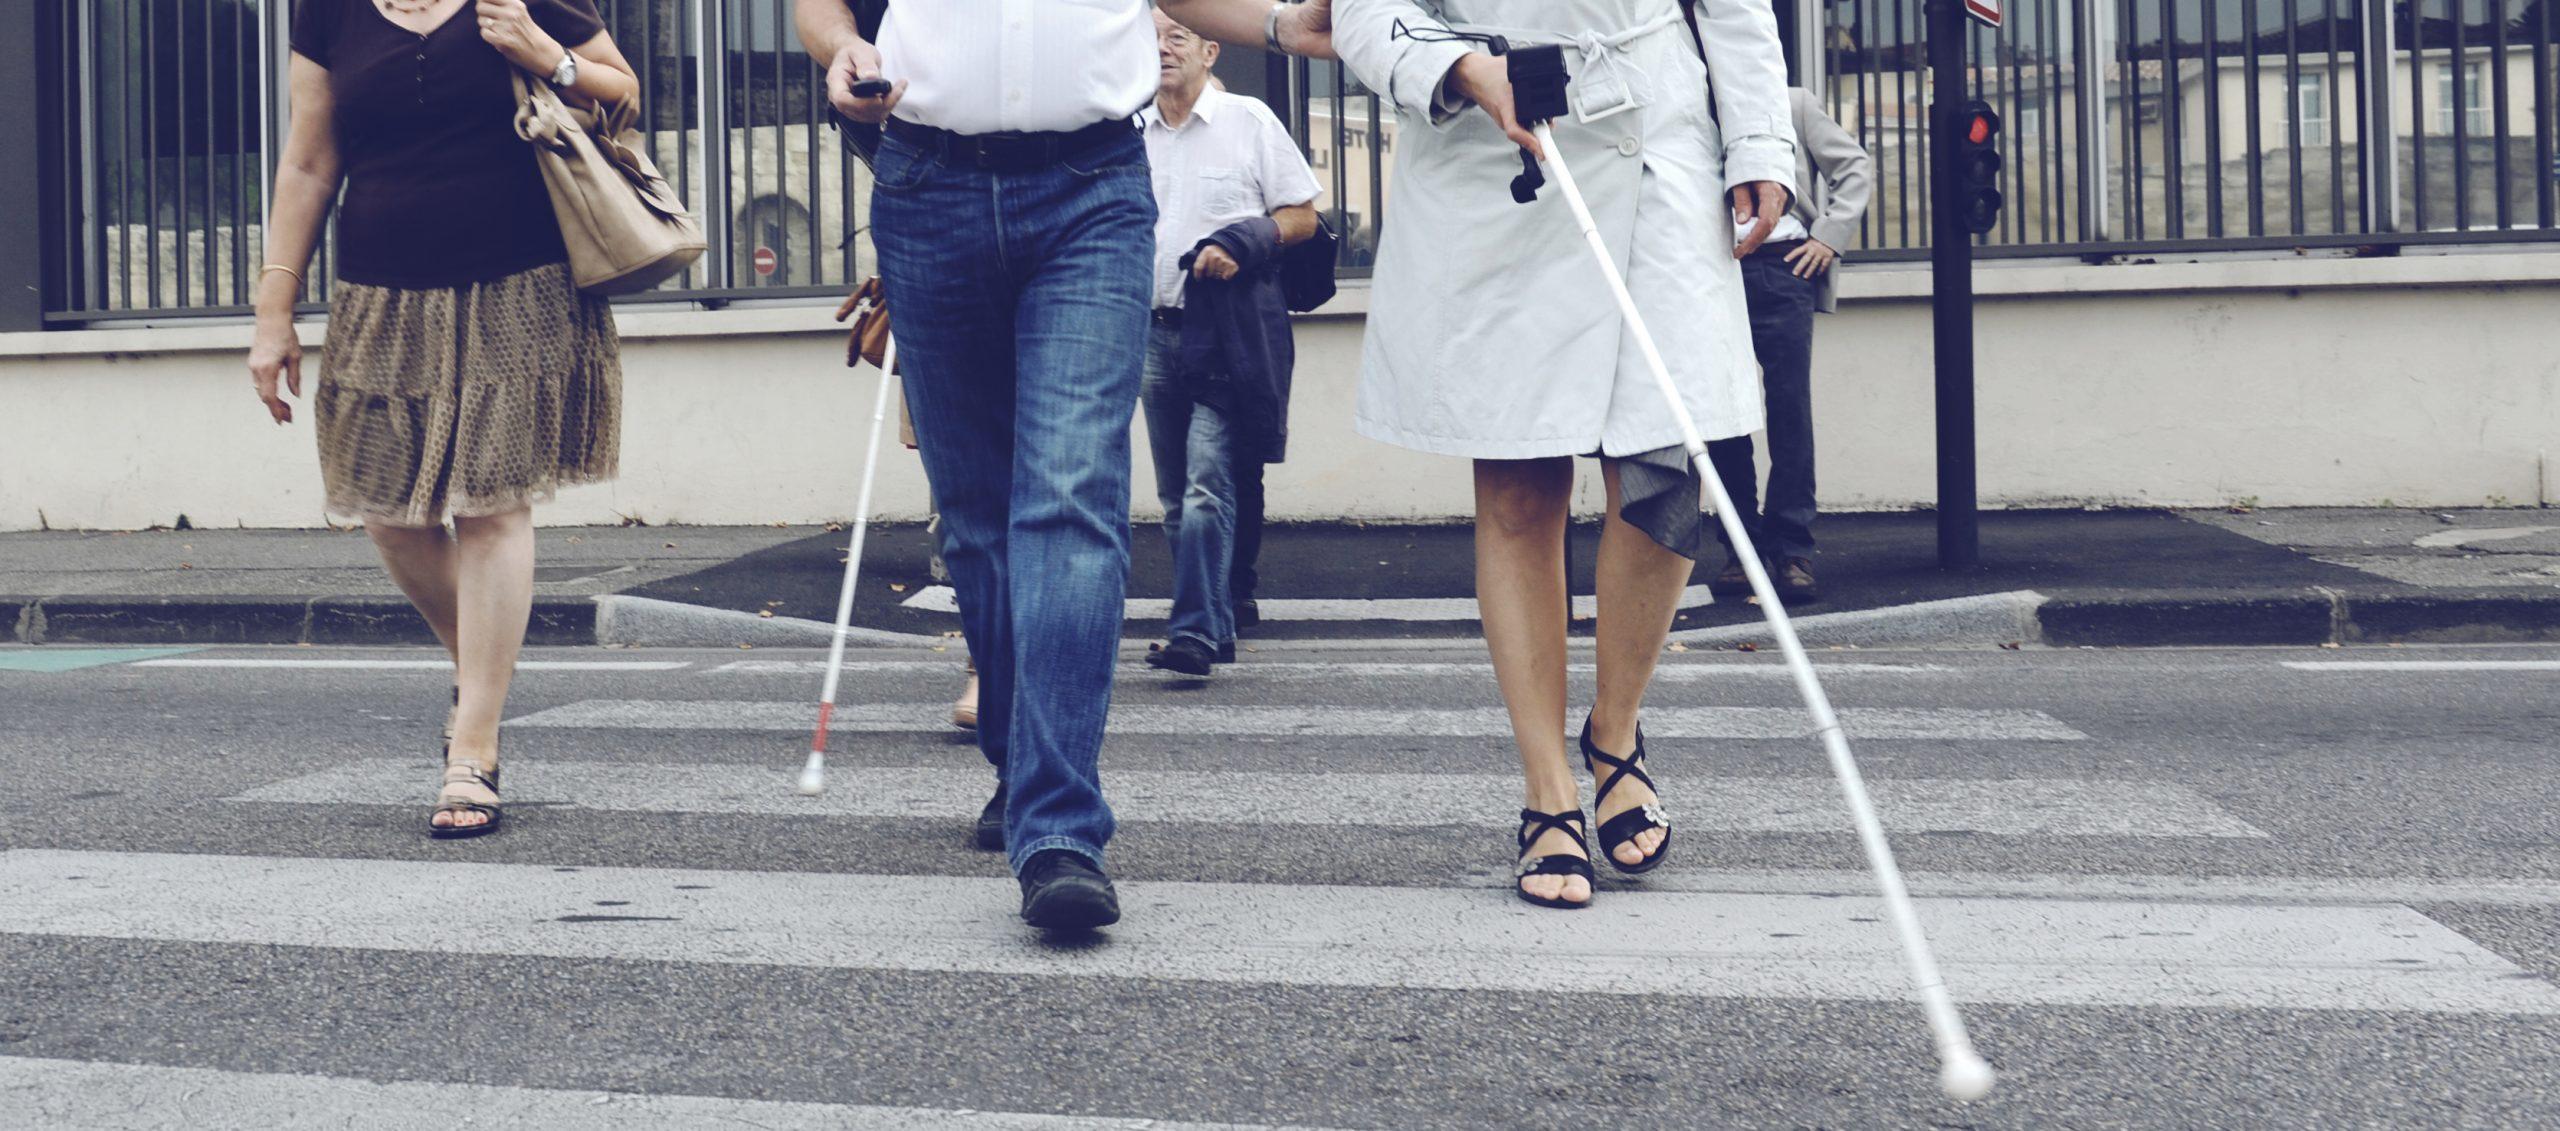 Handicap: Mairie D'avignon - Site Officiel dedans Piscine Stuart Mill Avignon